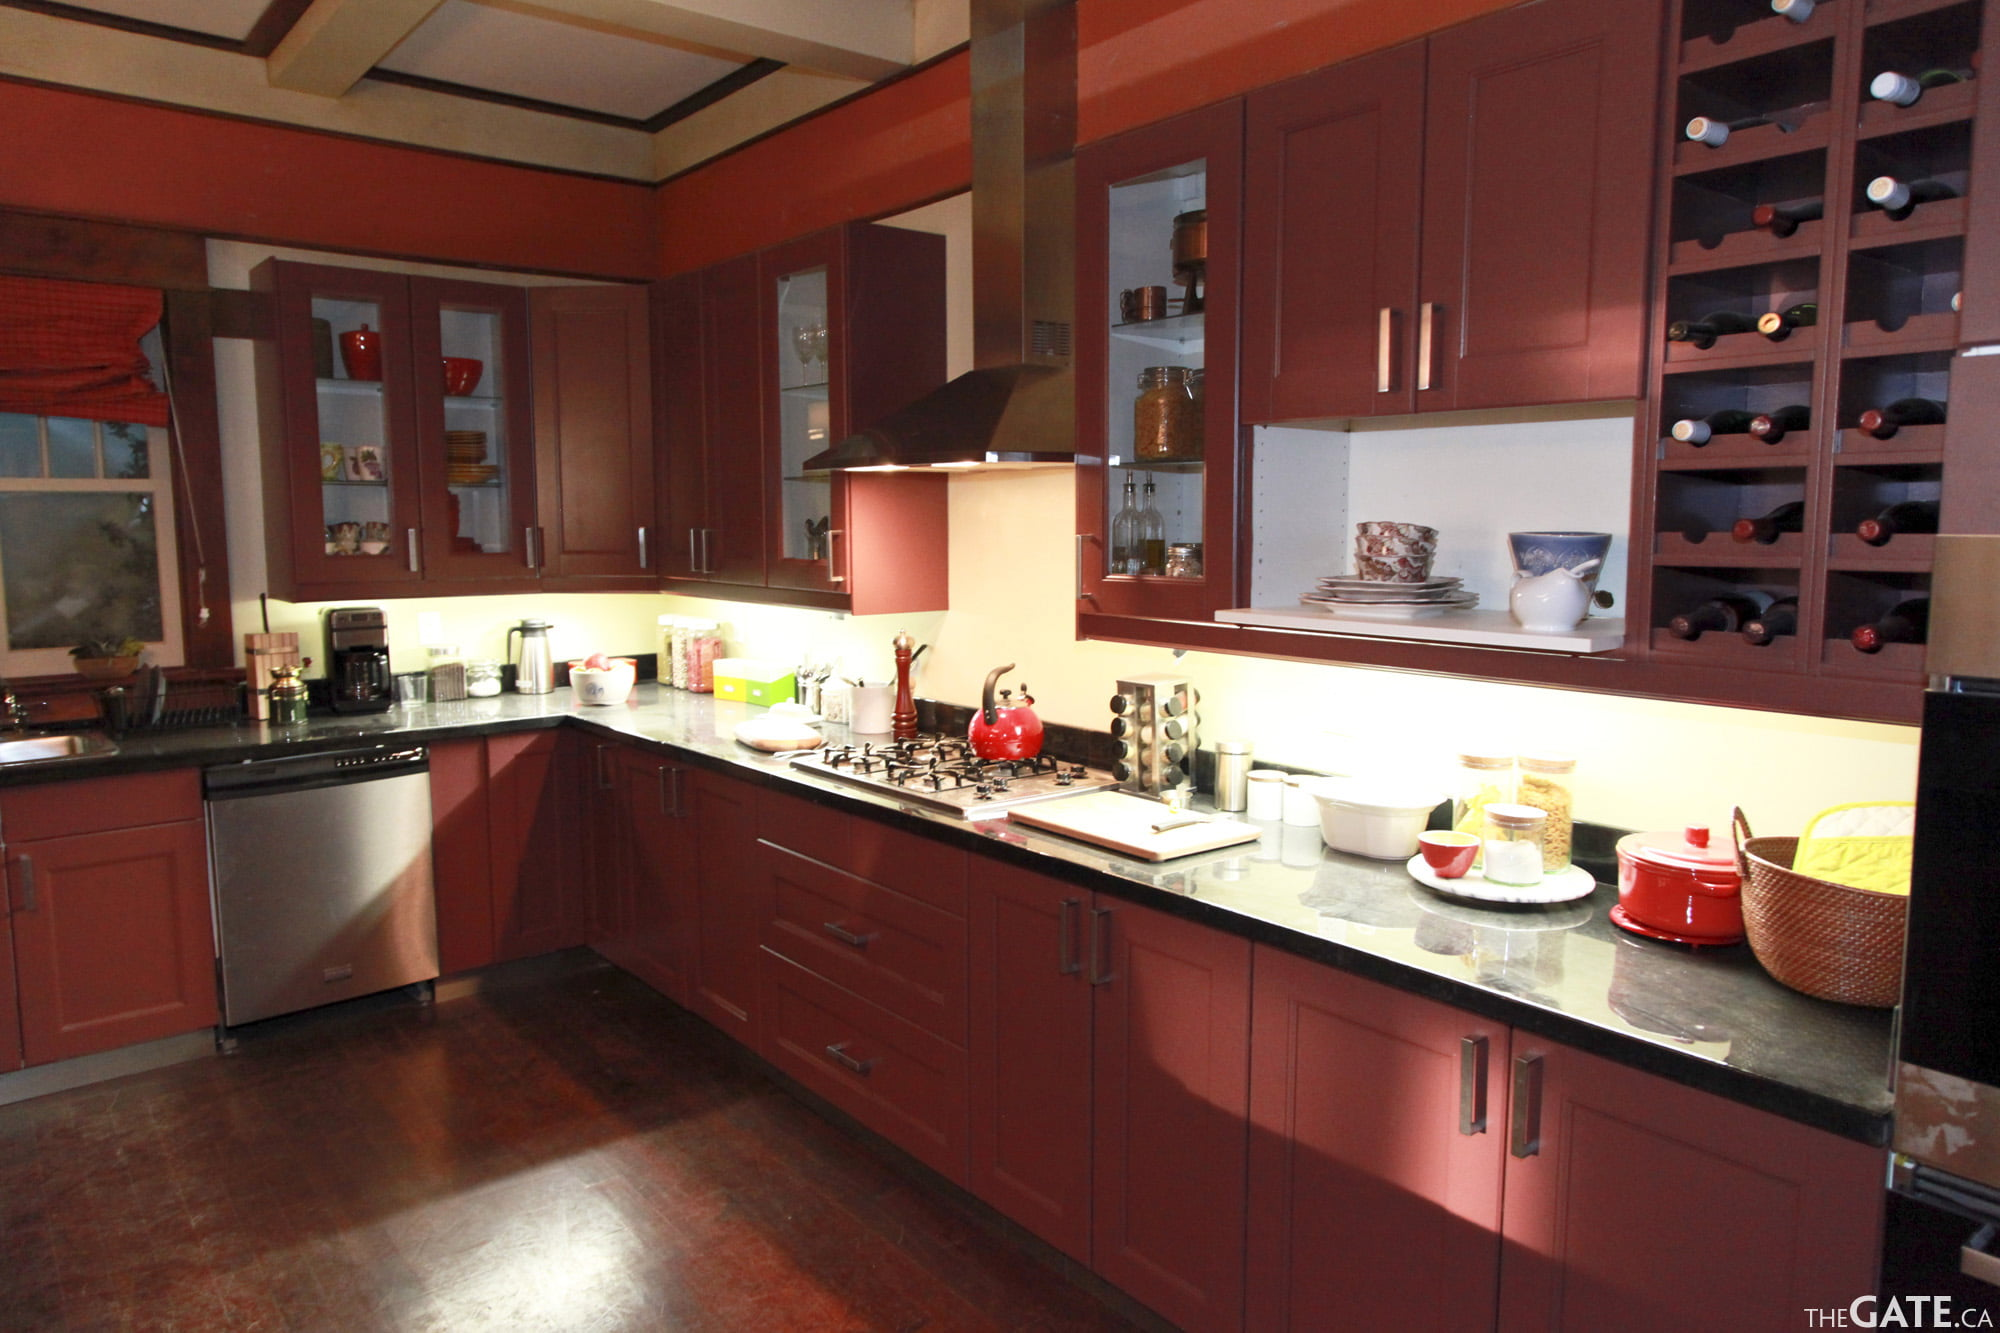 Rafe McCawley's kitchen